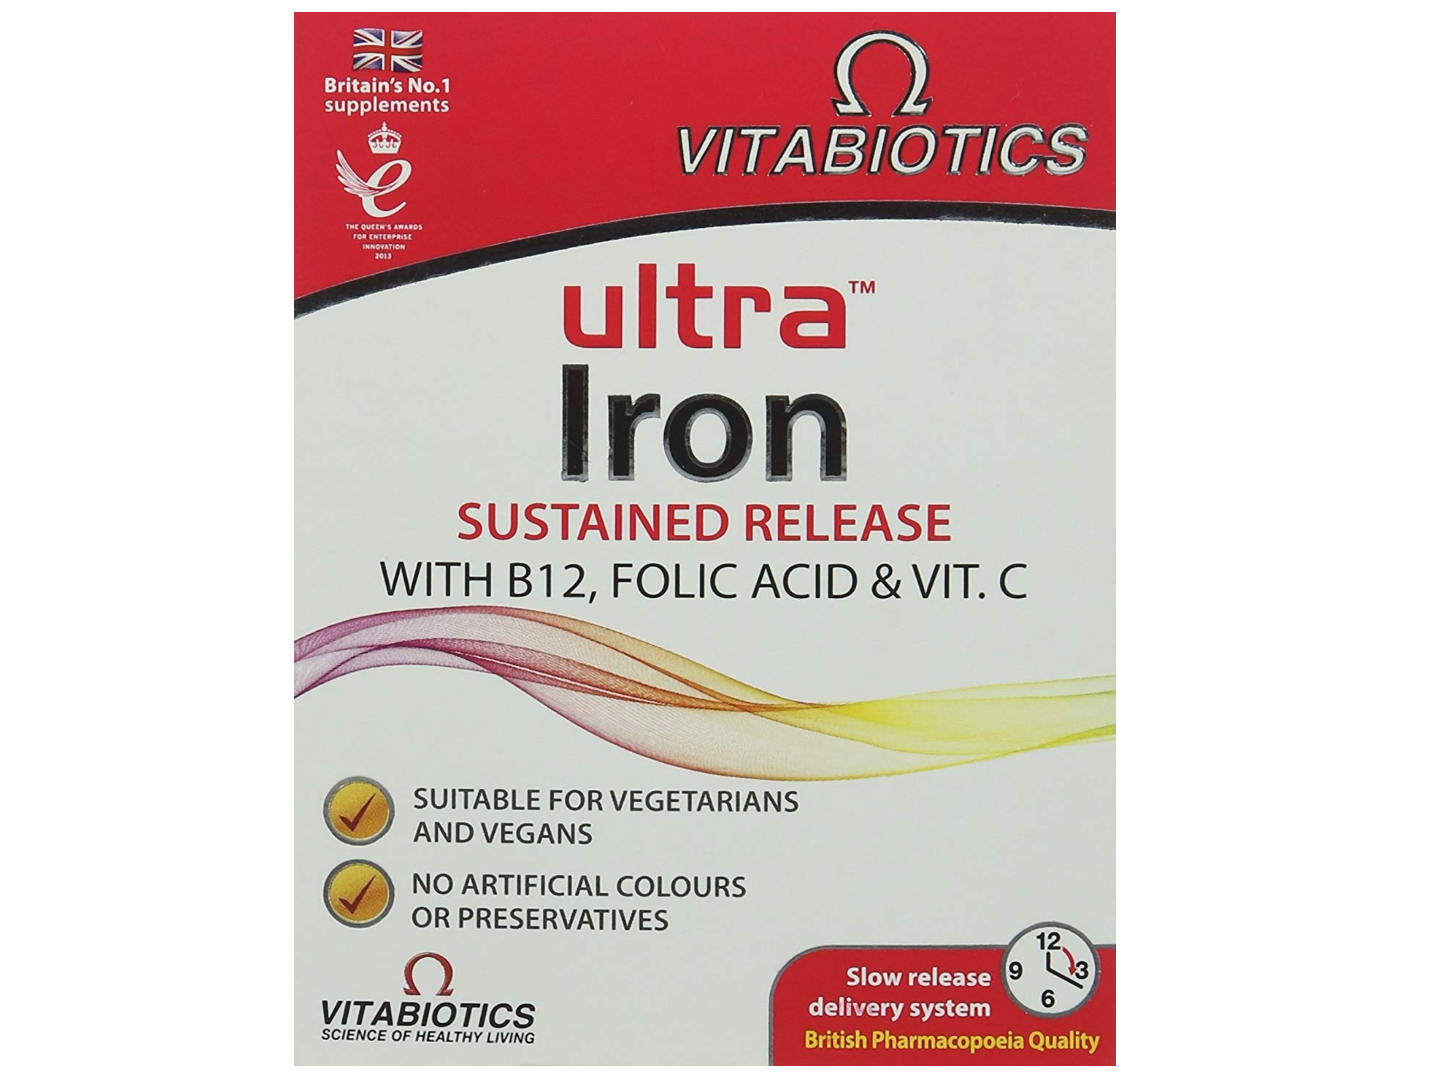 Vitabiotics Ultra Iron - Best Iron Supplements During Pregnancy